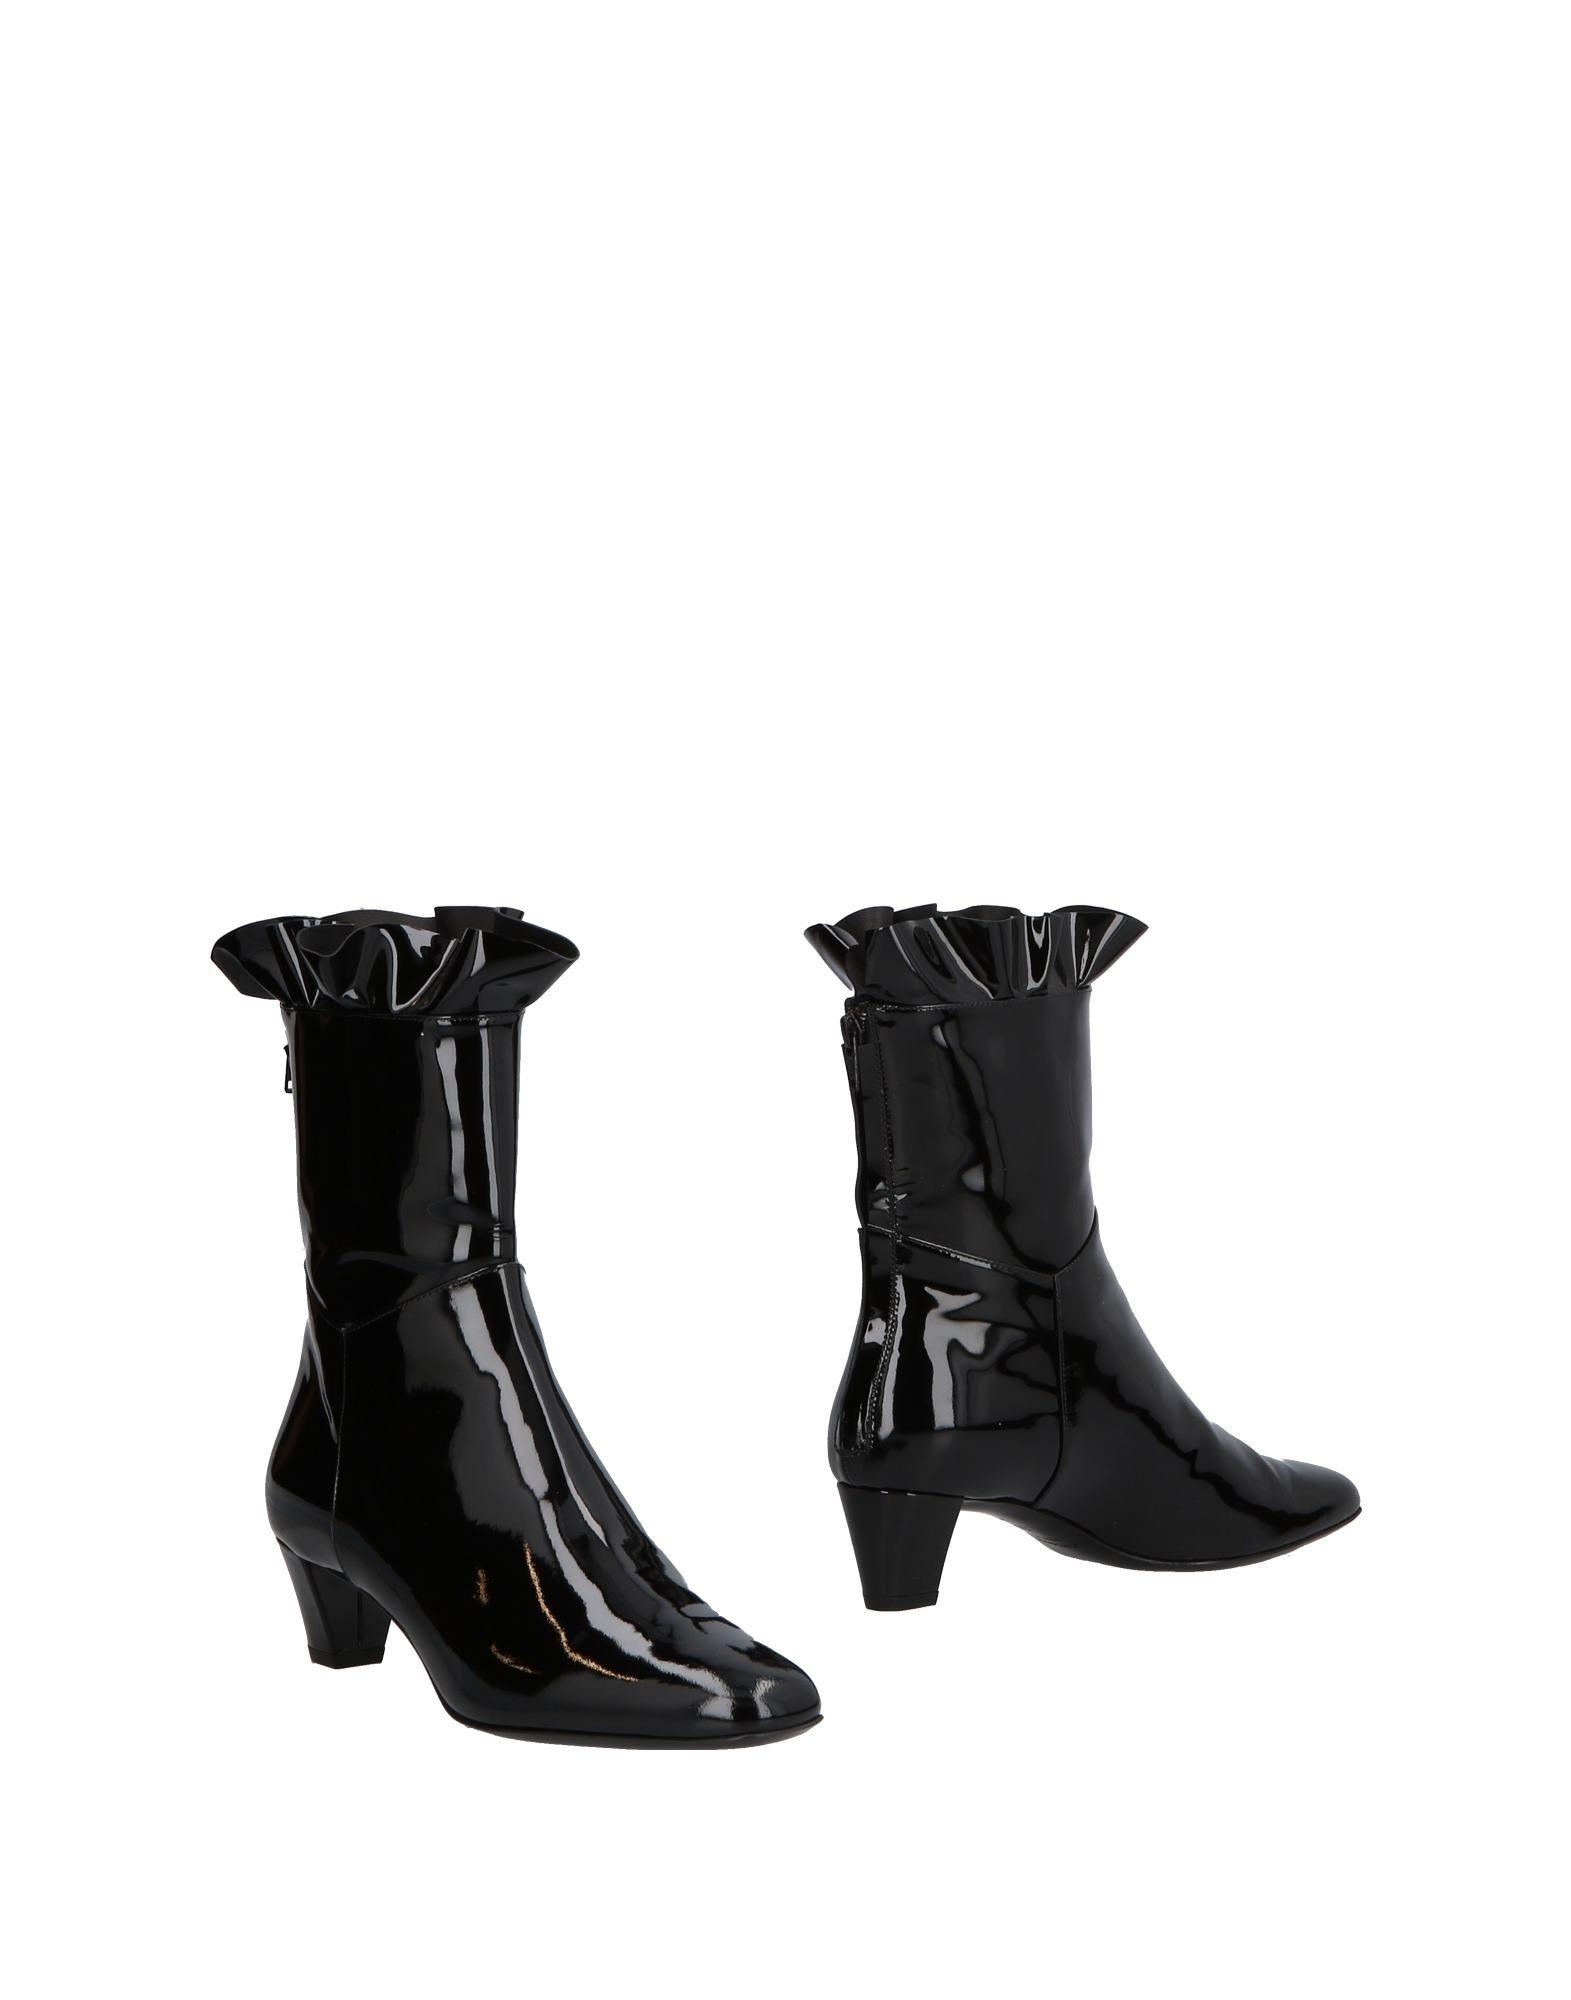 Philosophy Di Lorenzo Serafini Stiefelette Damen  11503306OPGünstige gut aussehende Schuhe